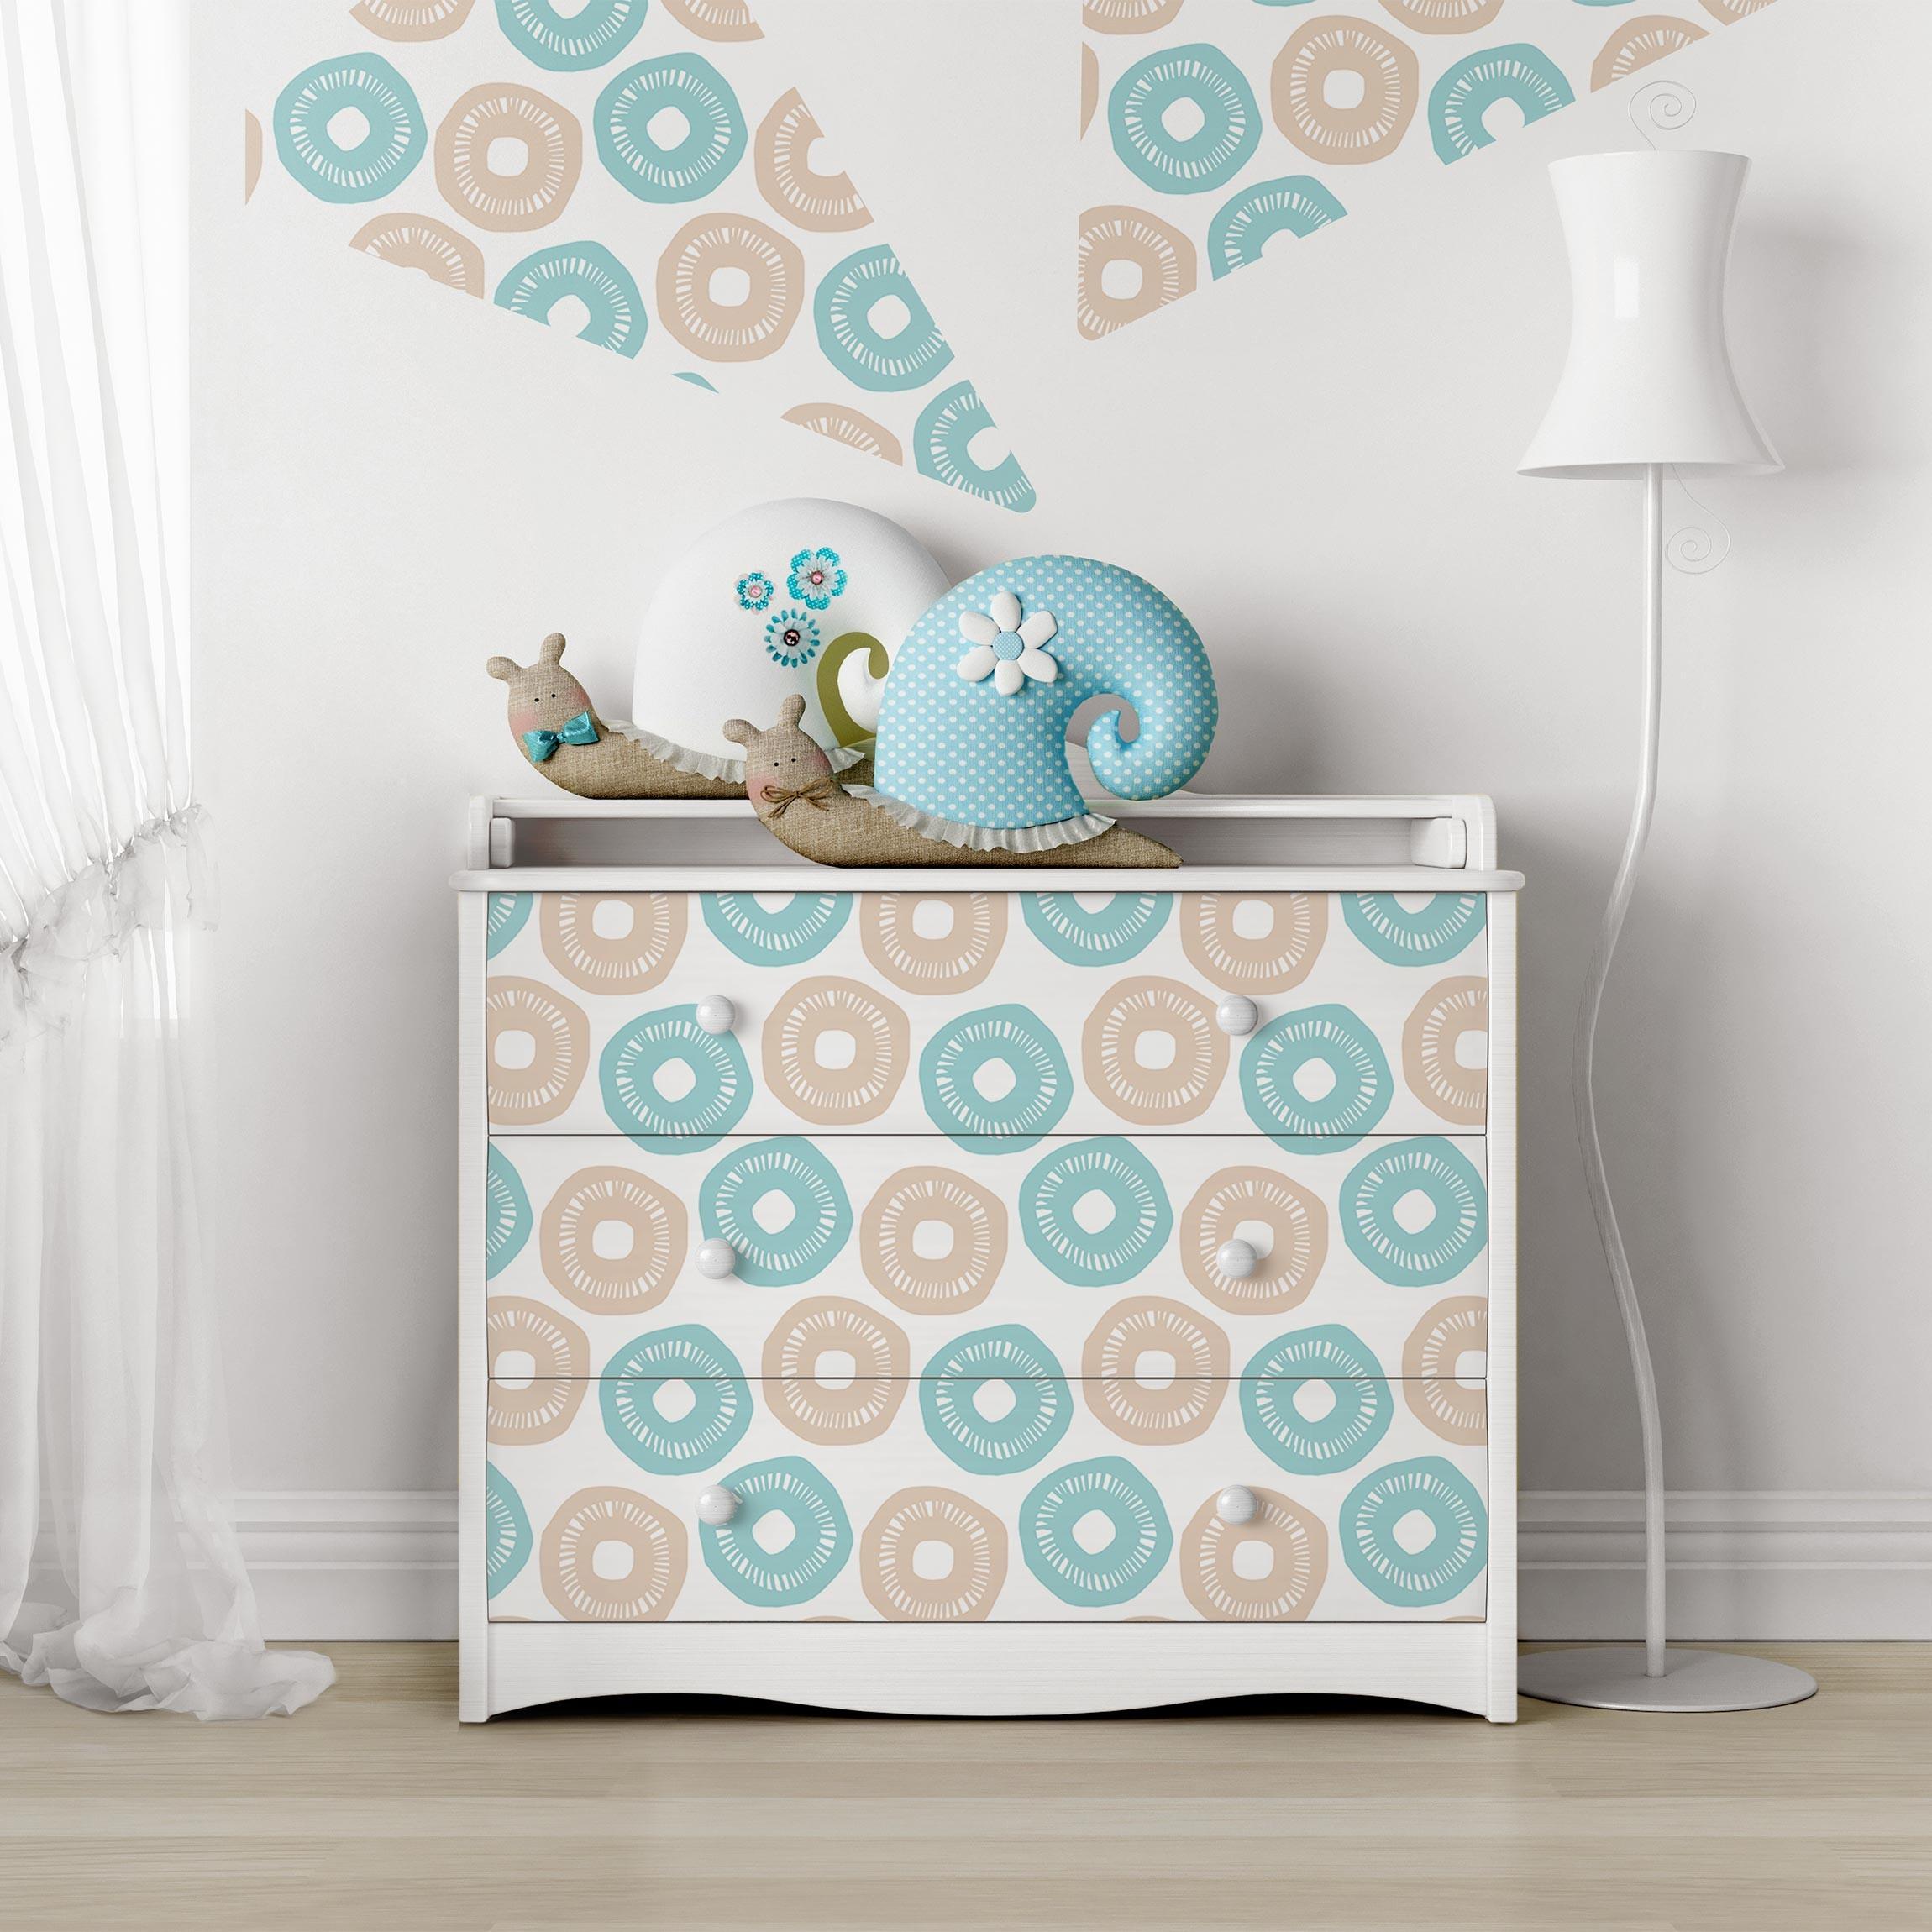 Carta adesiva per mobili modern pastel pattern light blue rose - Carte adesive per mobili ...